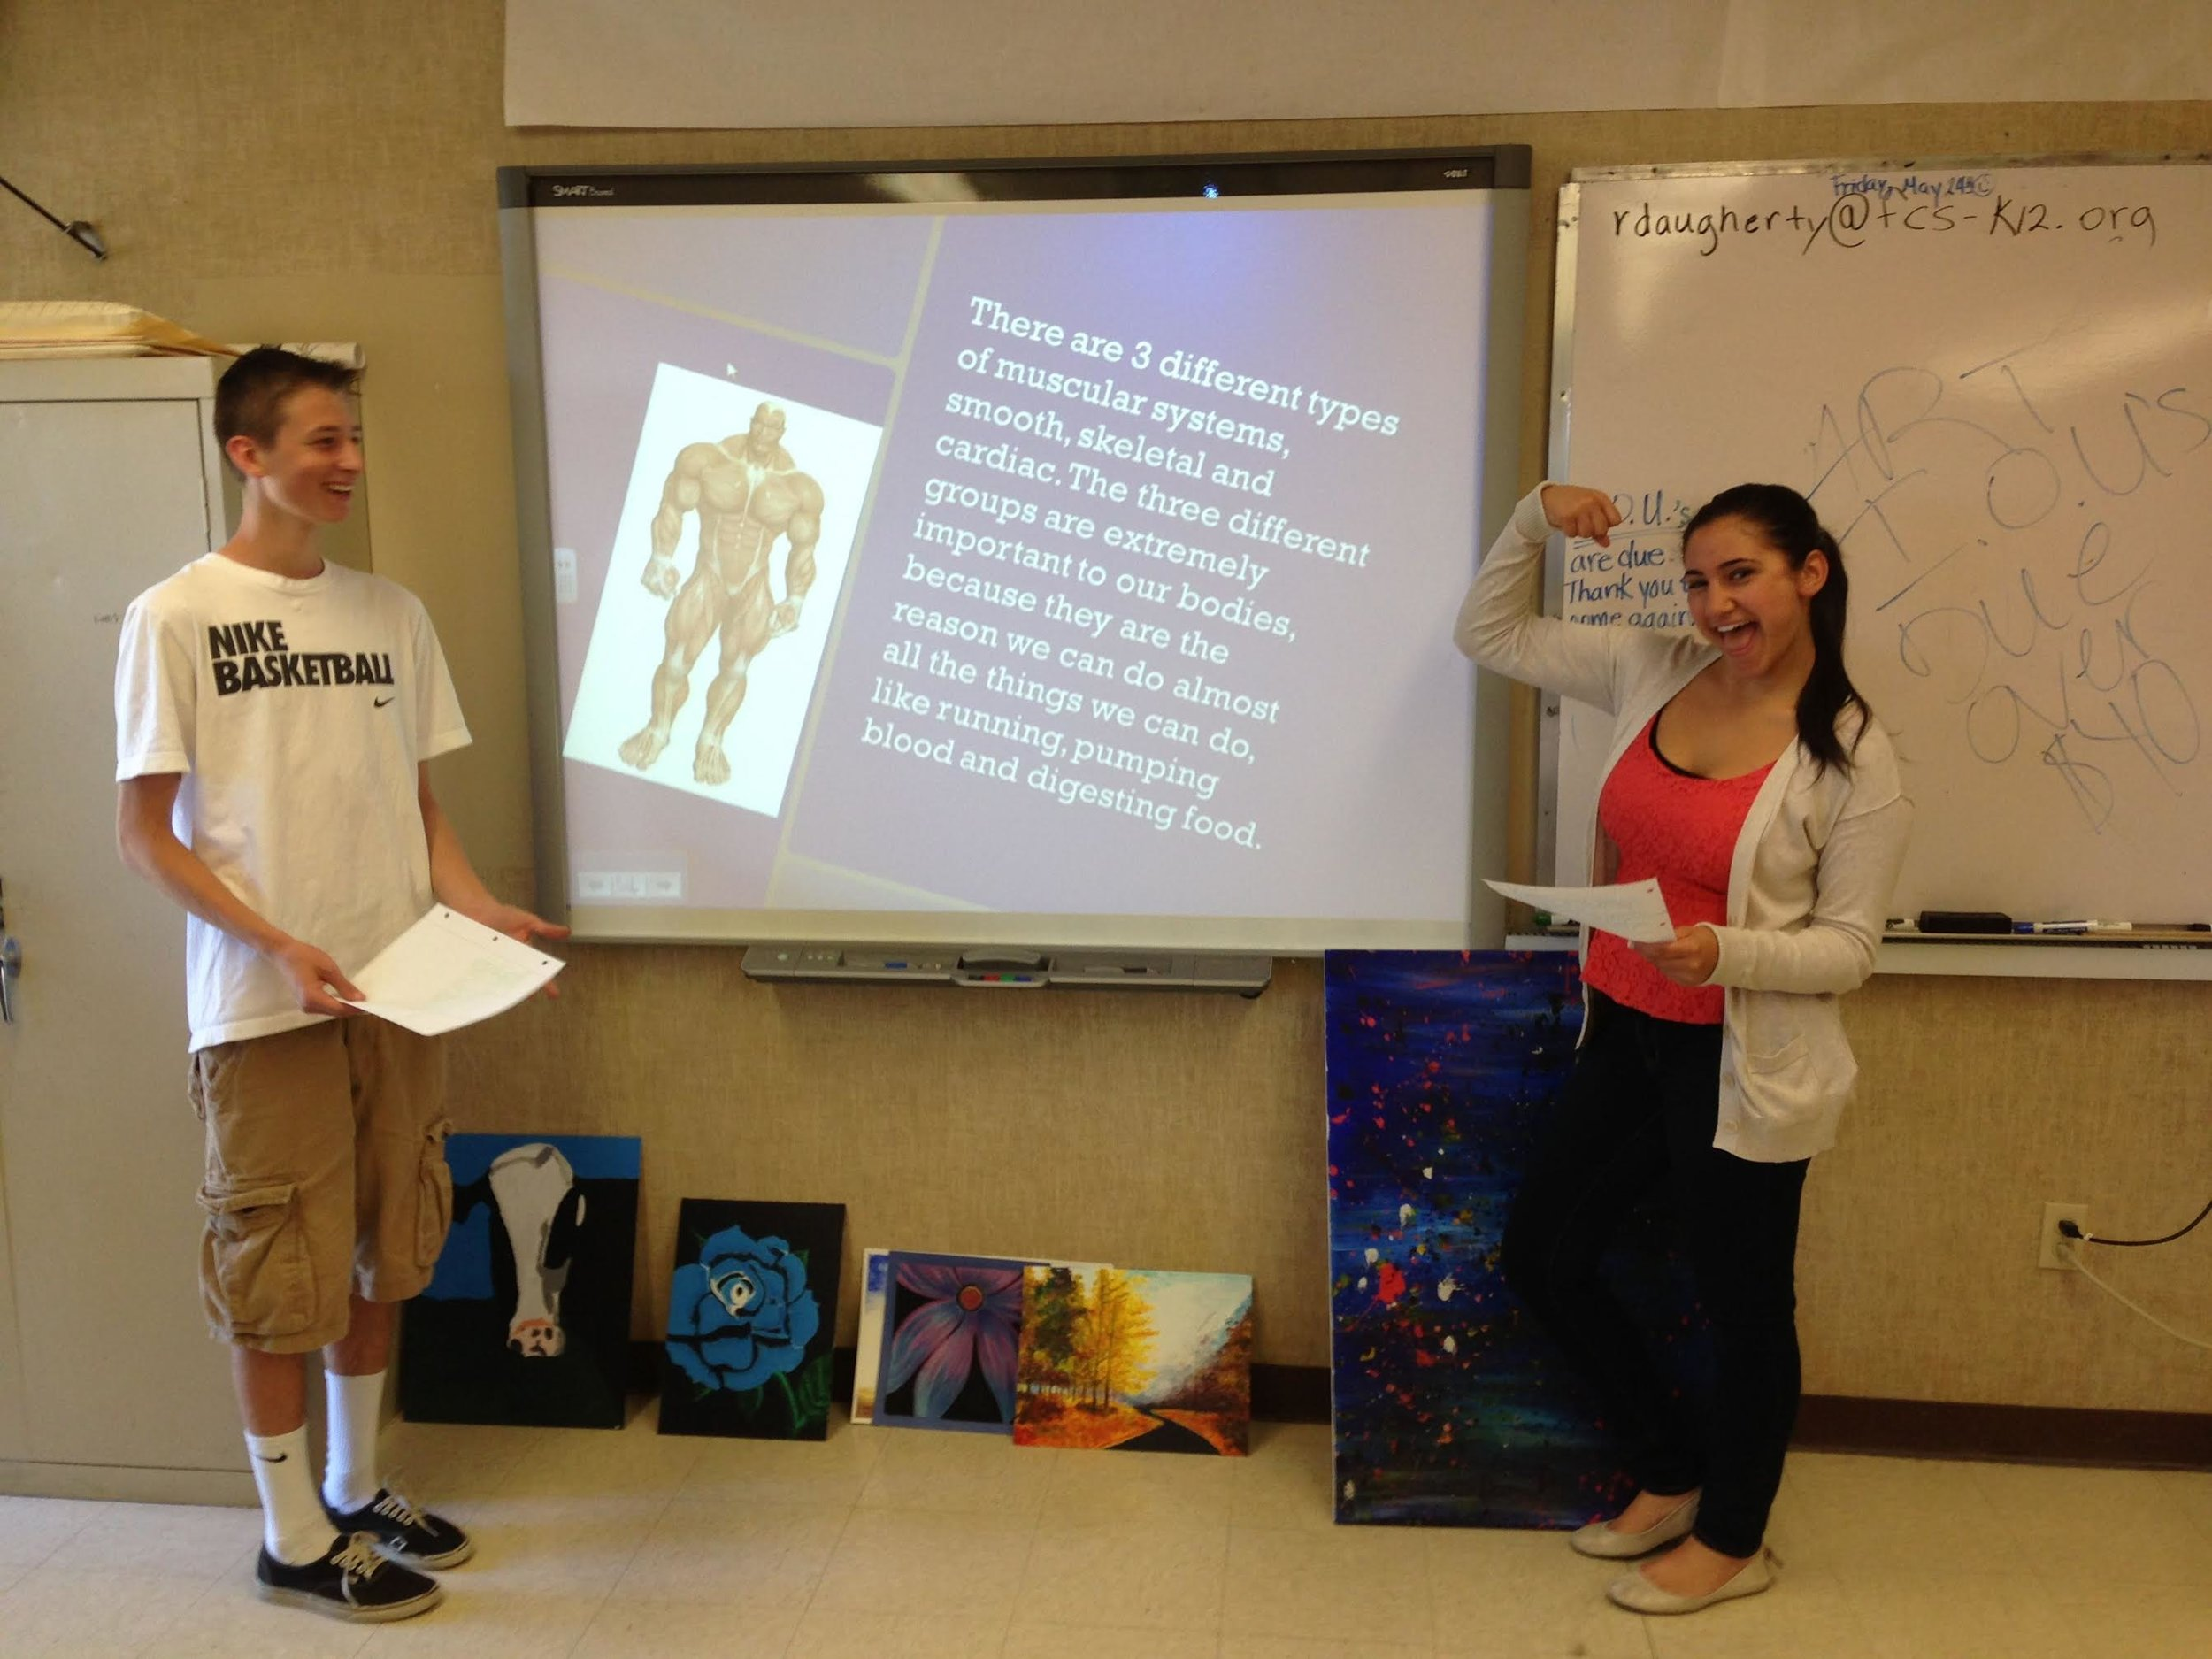 Health Class Muscular system presentation